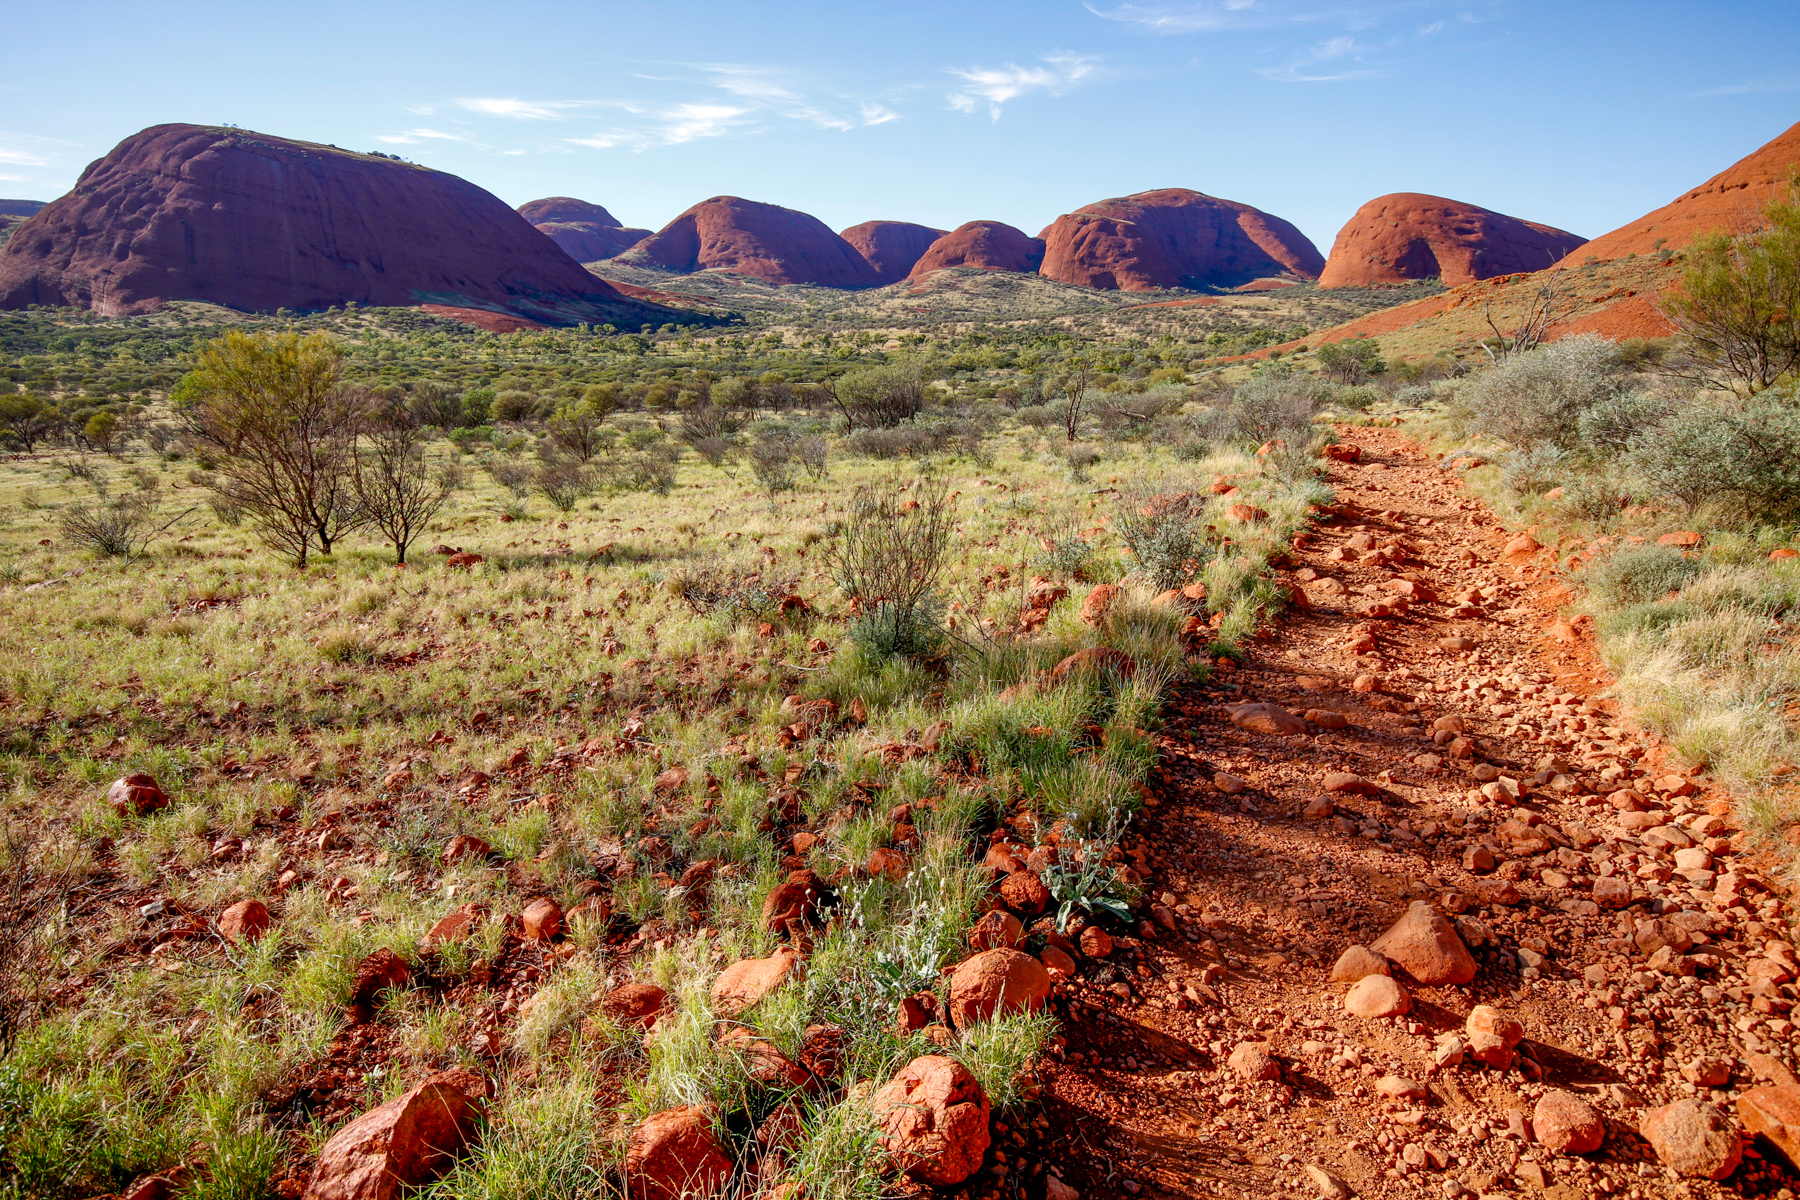 mg 1447 lr What to do in Uluru